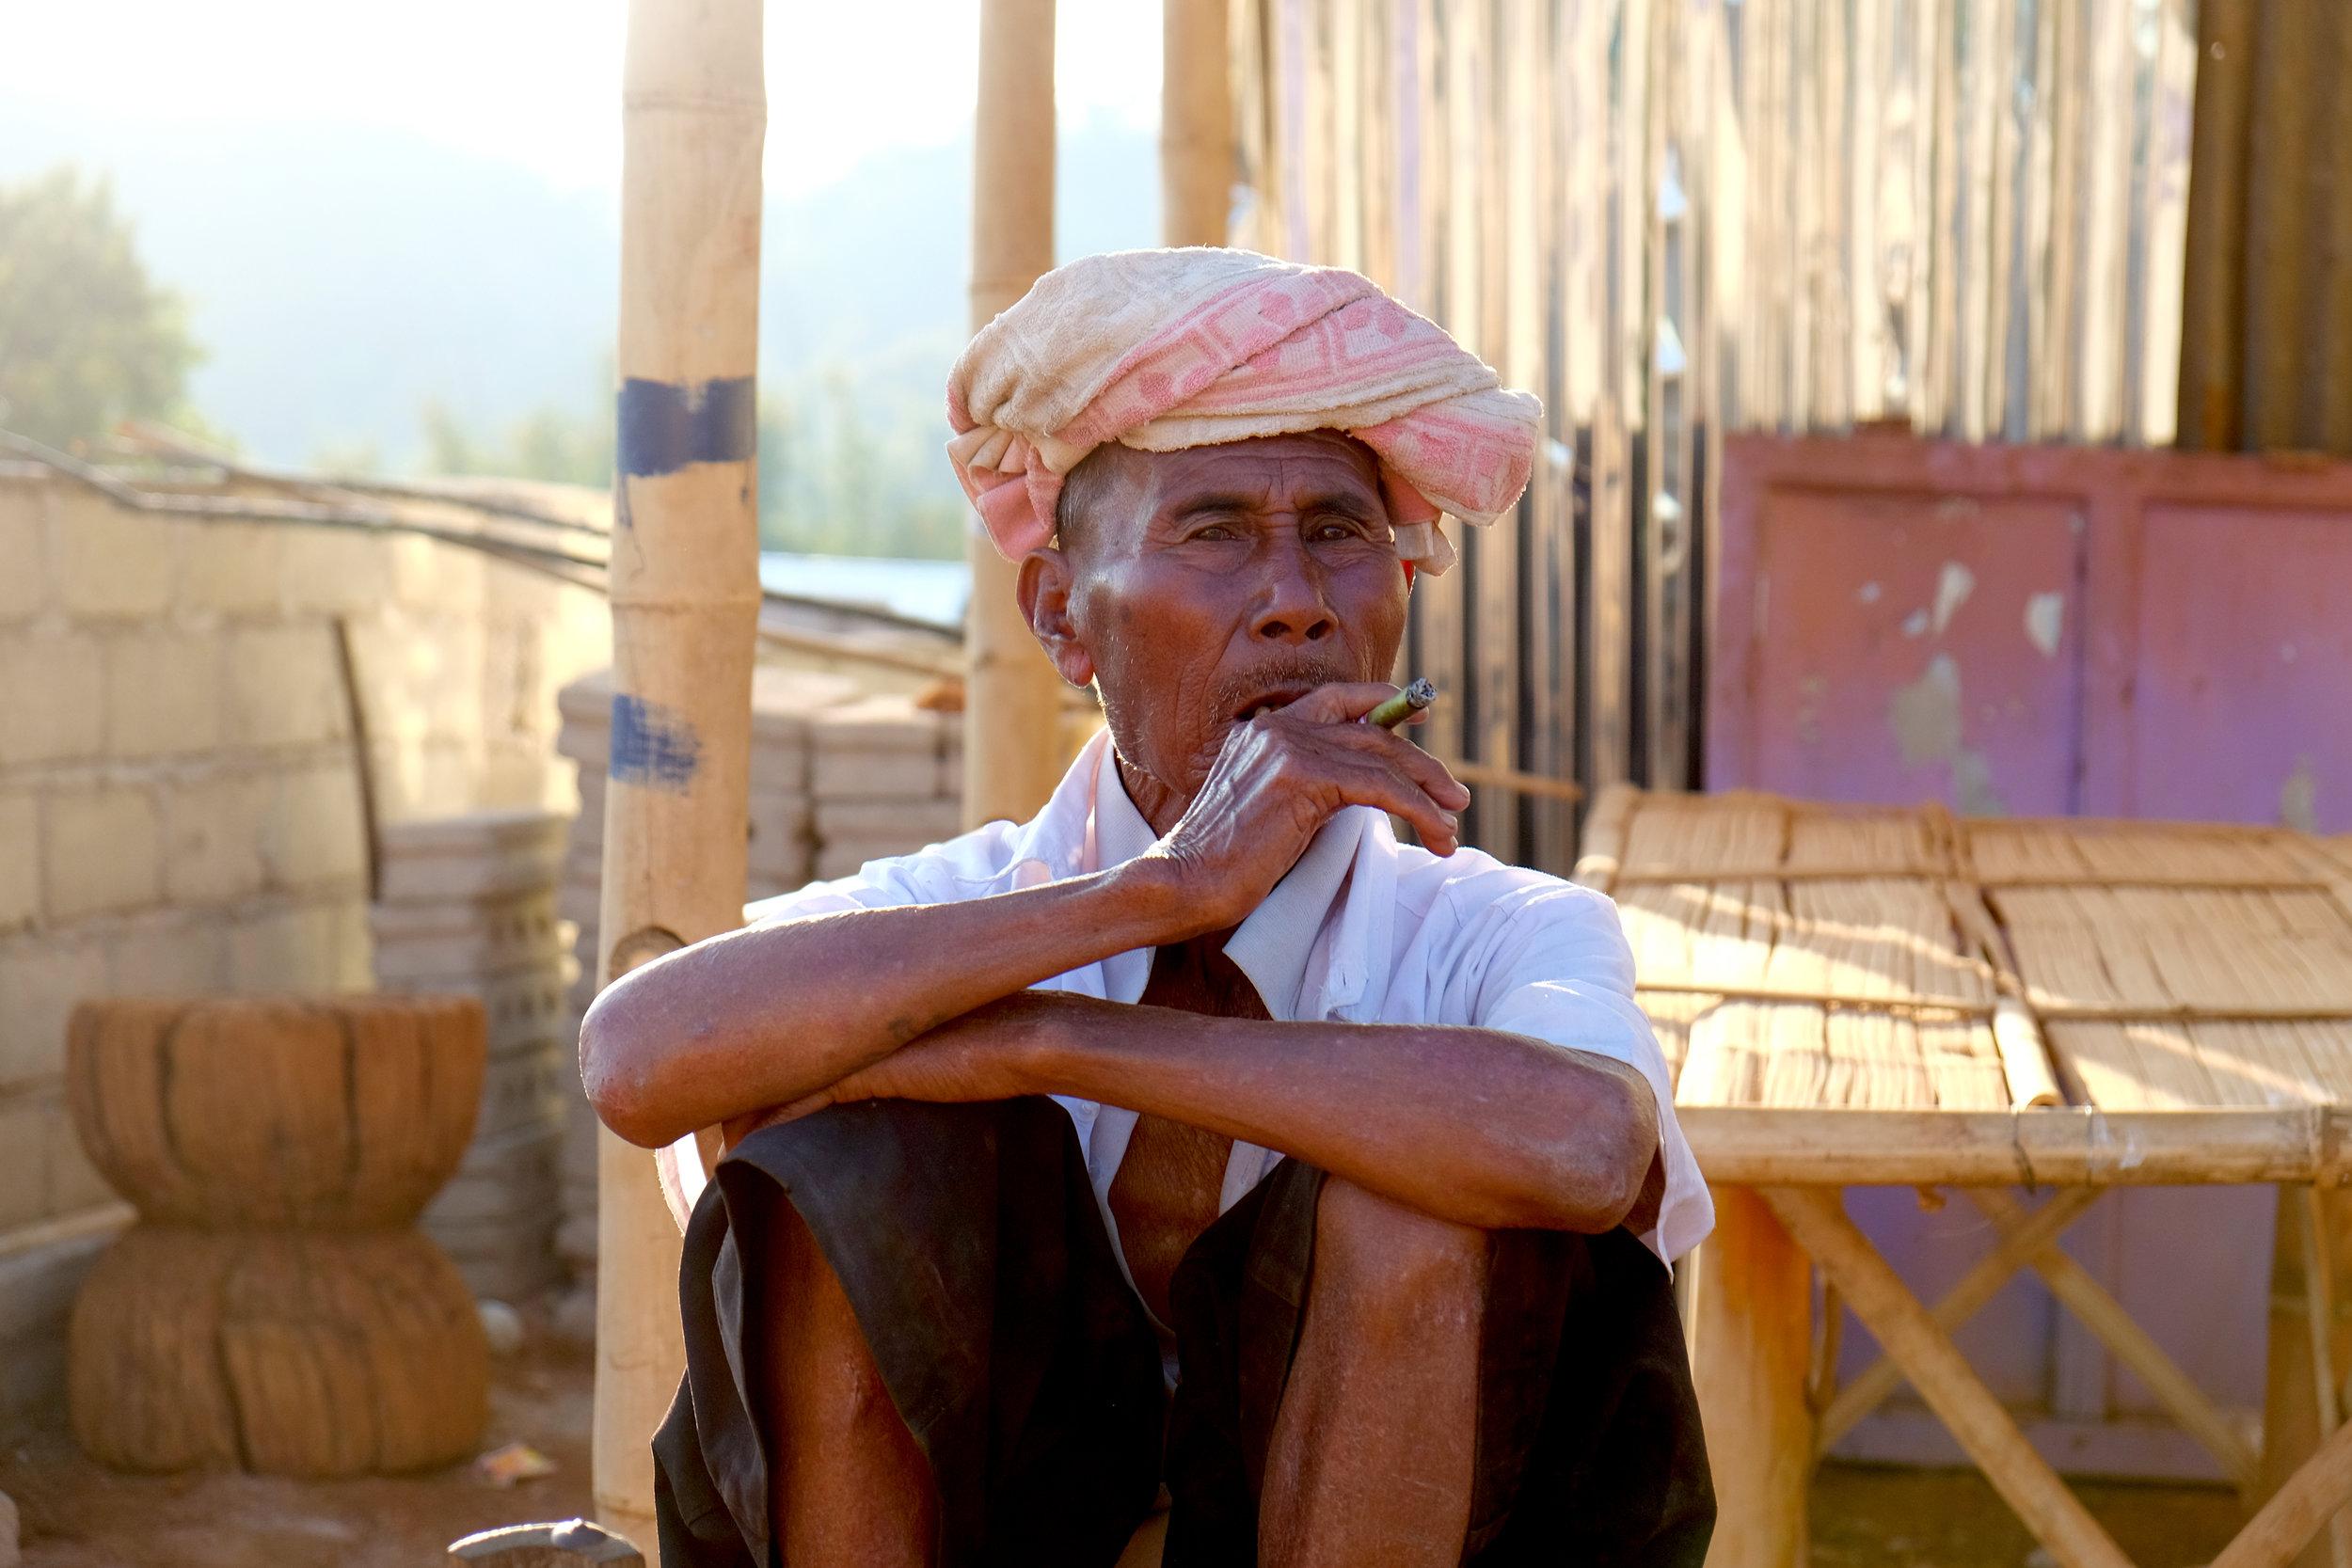 Tantu tribesman smoking a cheroot cigarette